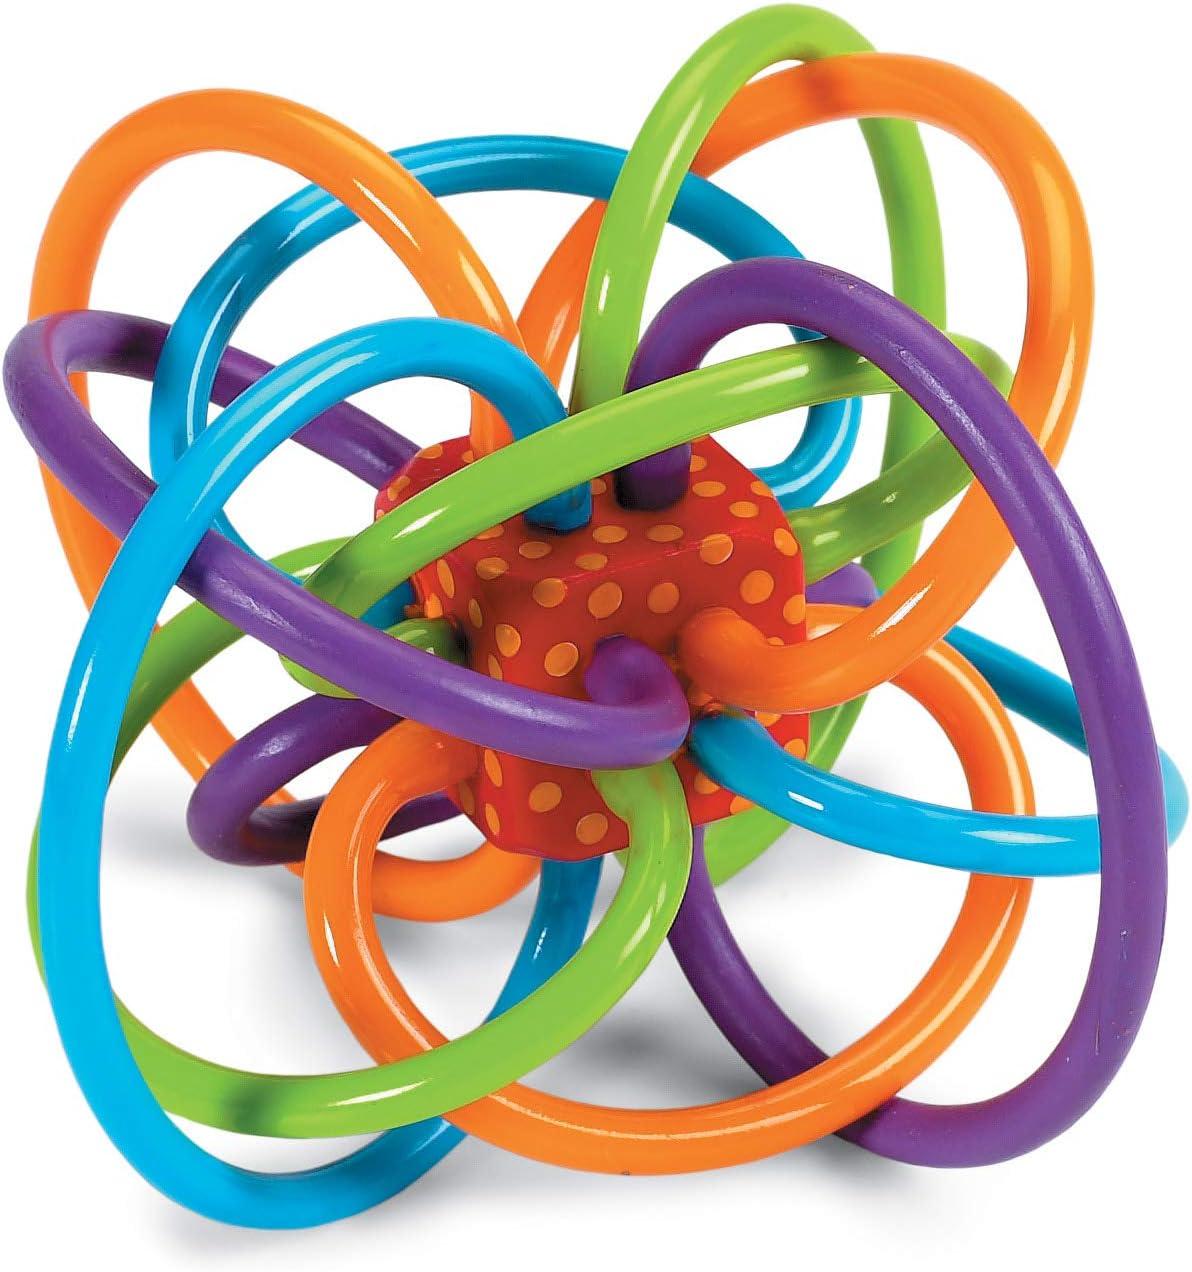 100% quality warranty! Manhattan Gifts Toy Winkel Teether Rattle Sensory